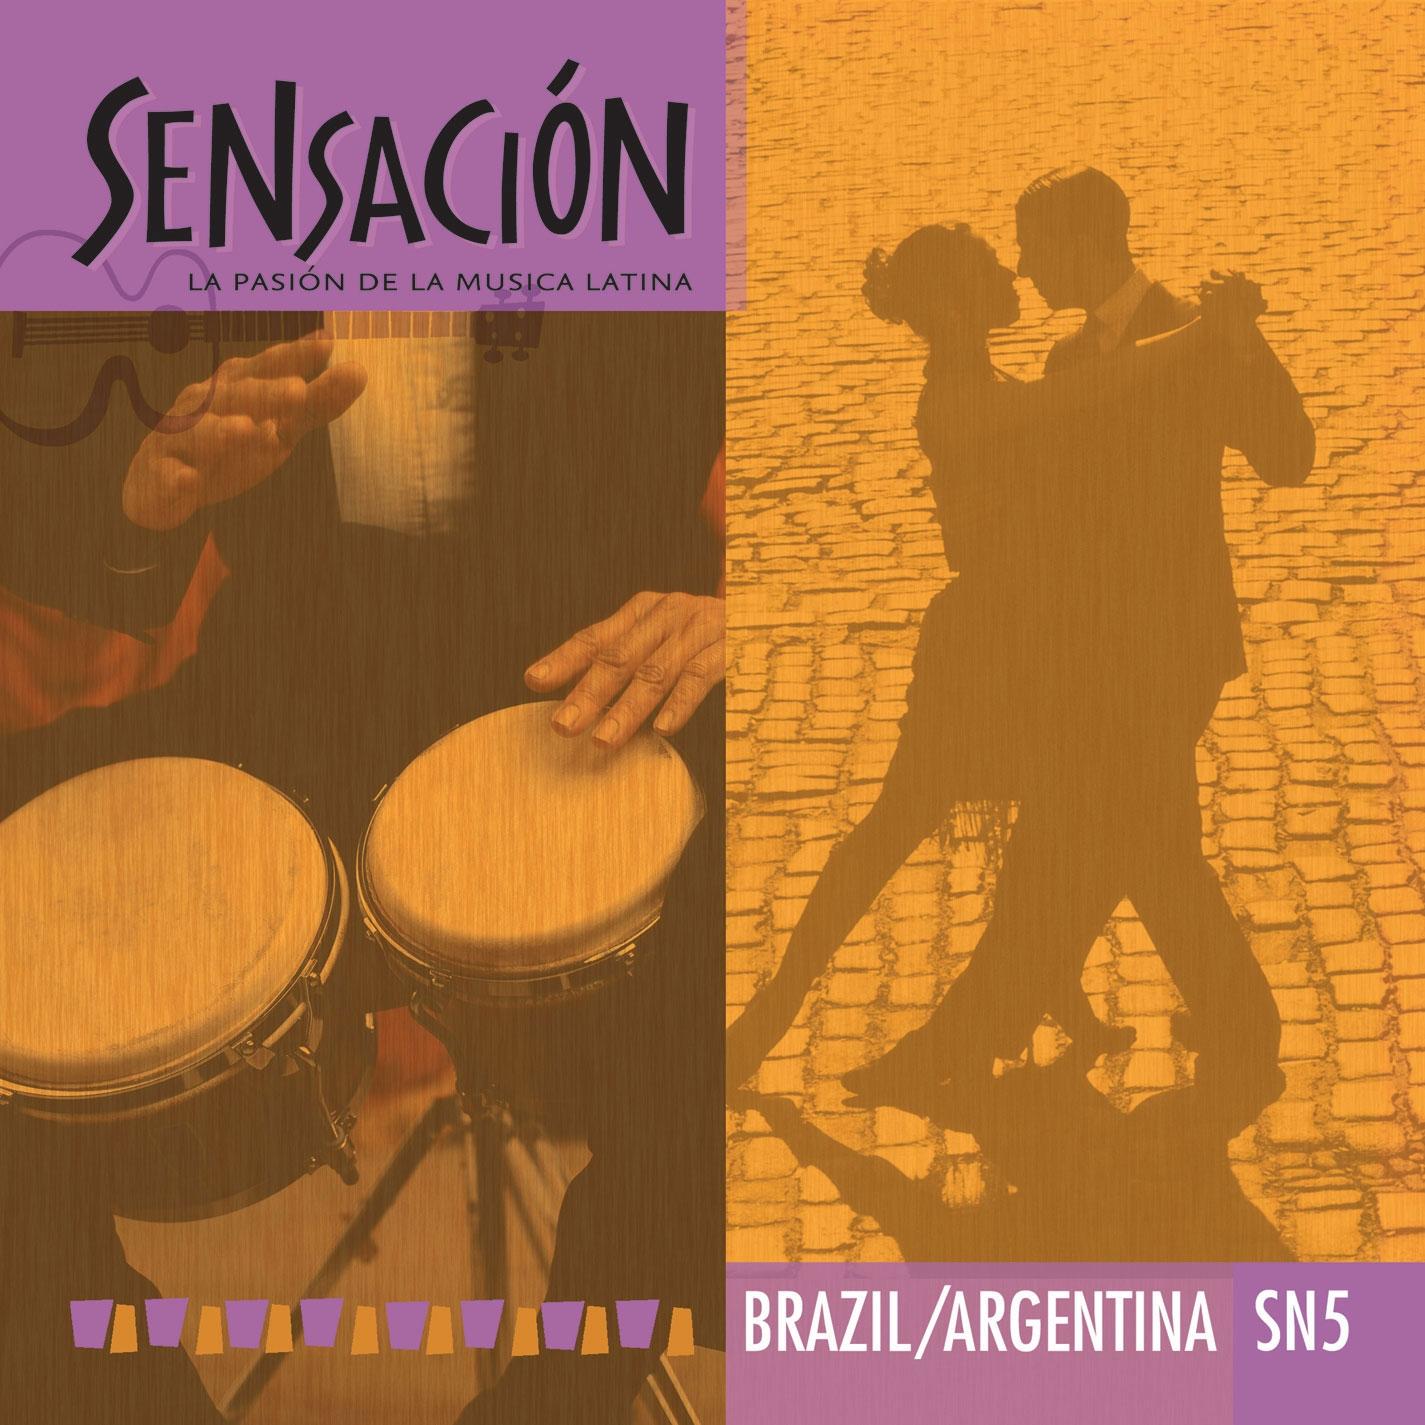 Brazil/ Argentina